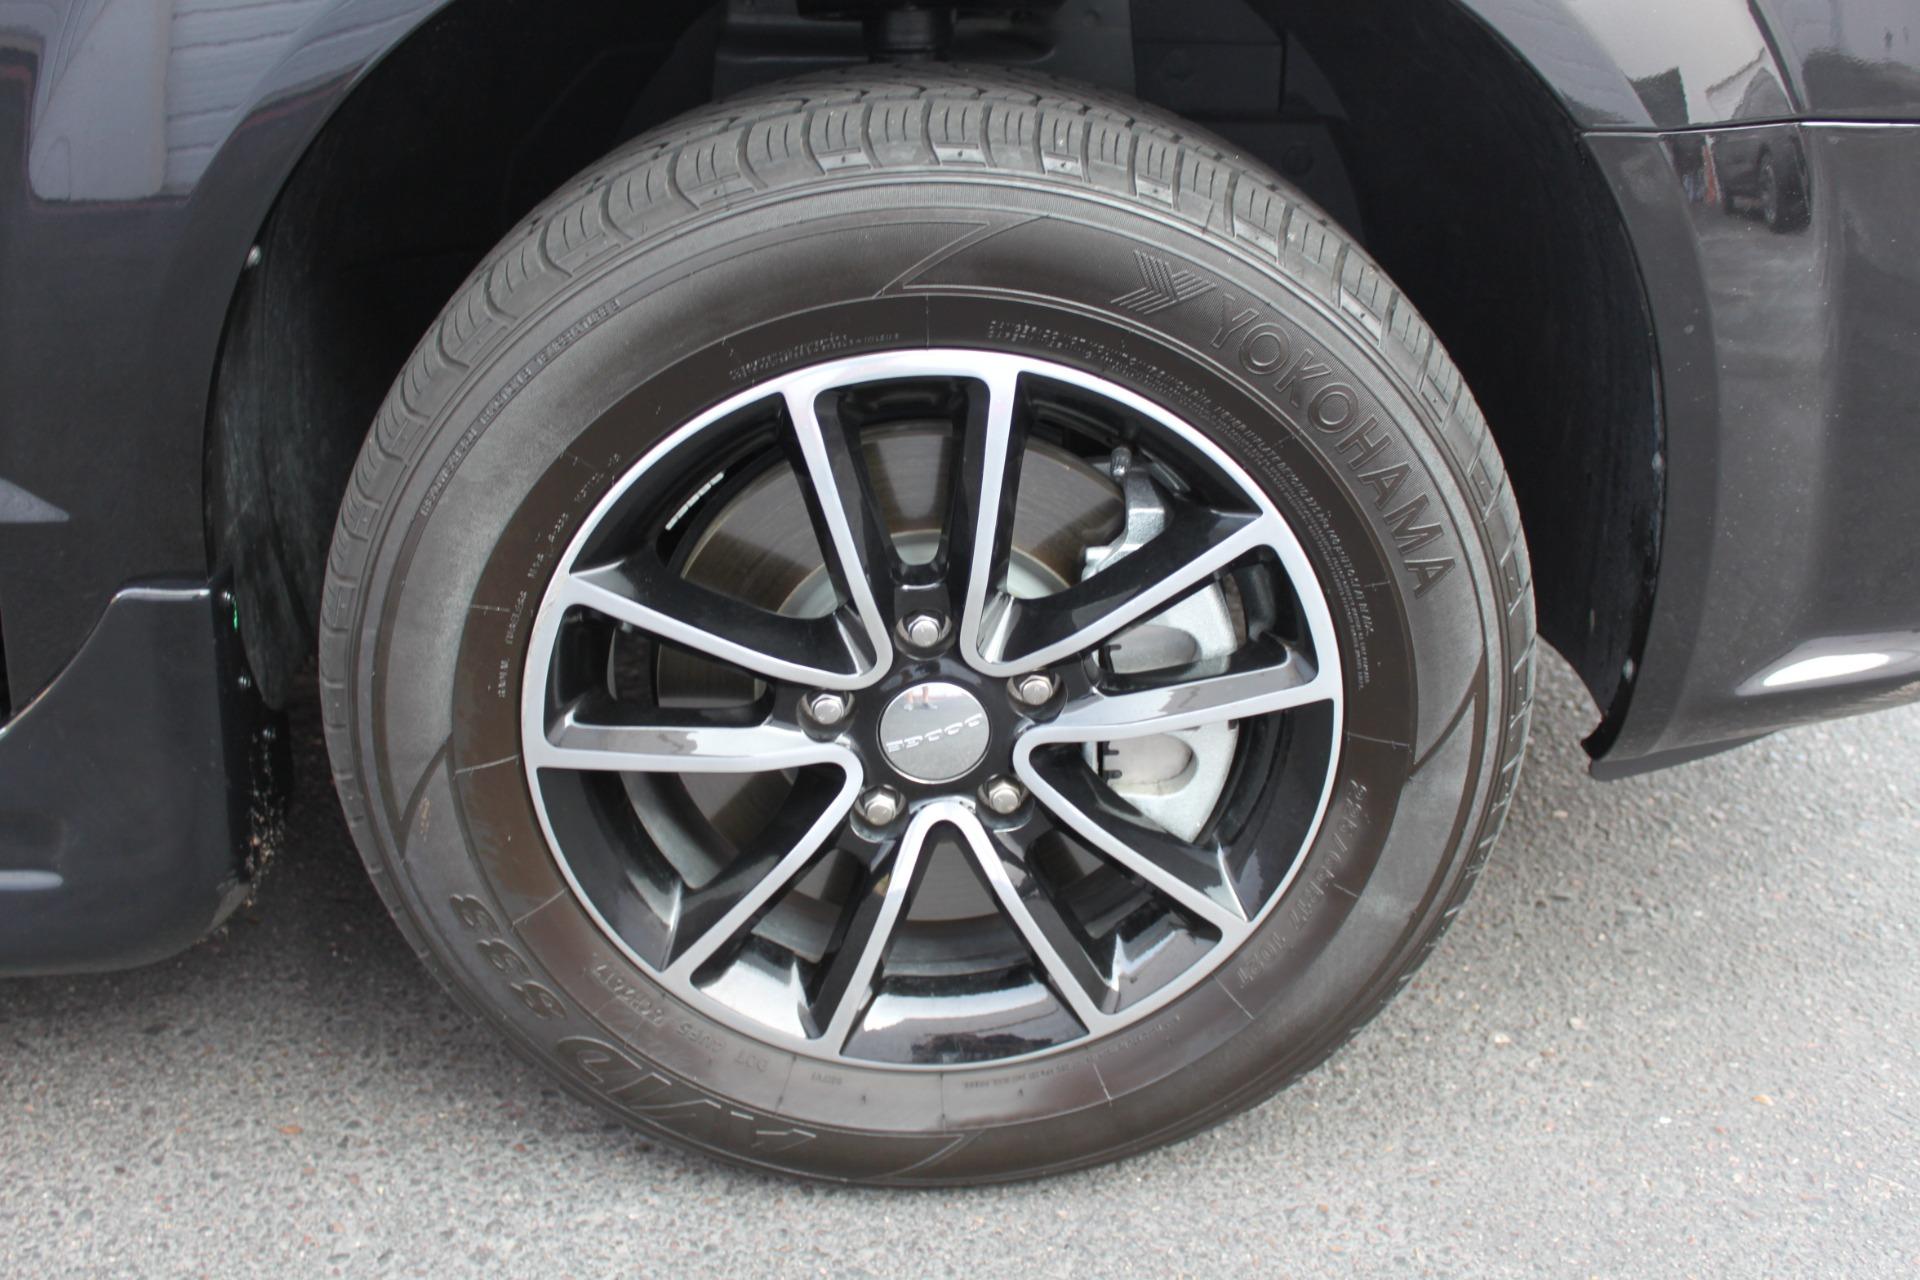 Used-2018-Dodge-Grand-Caravan-SXT-Rollx-Mobility-Conversion-Acura